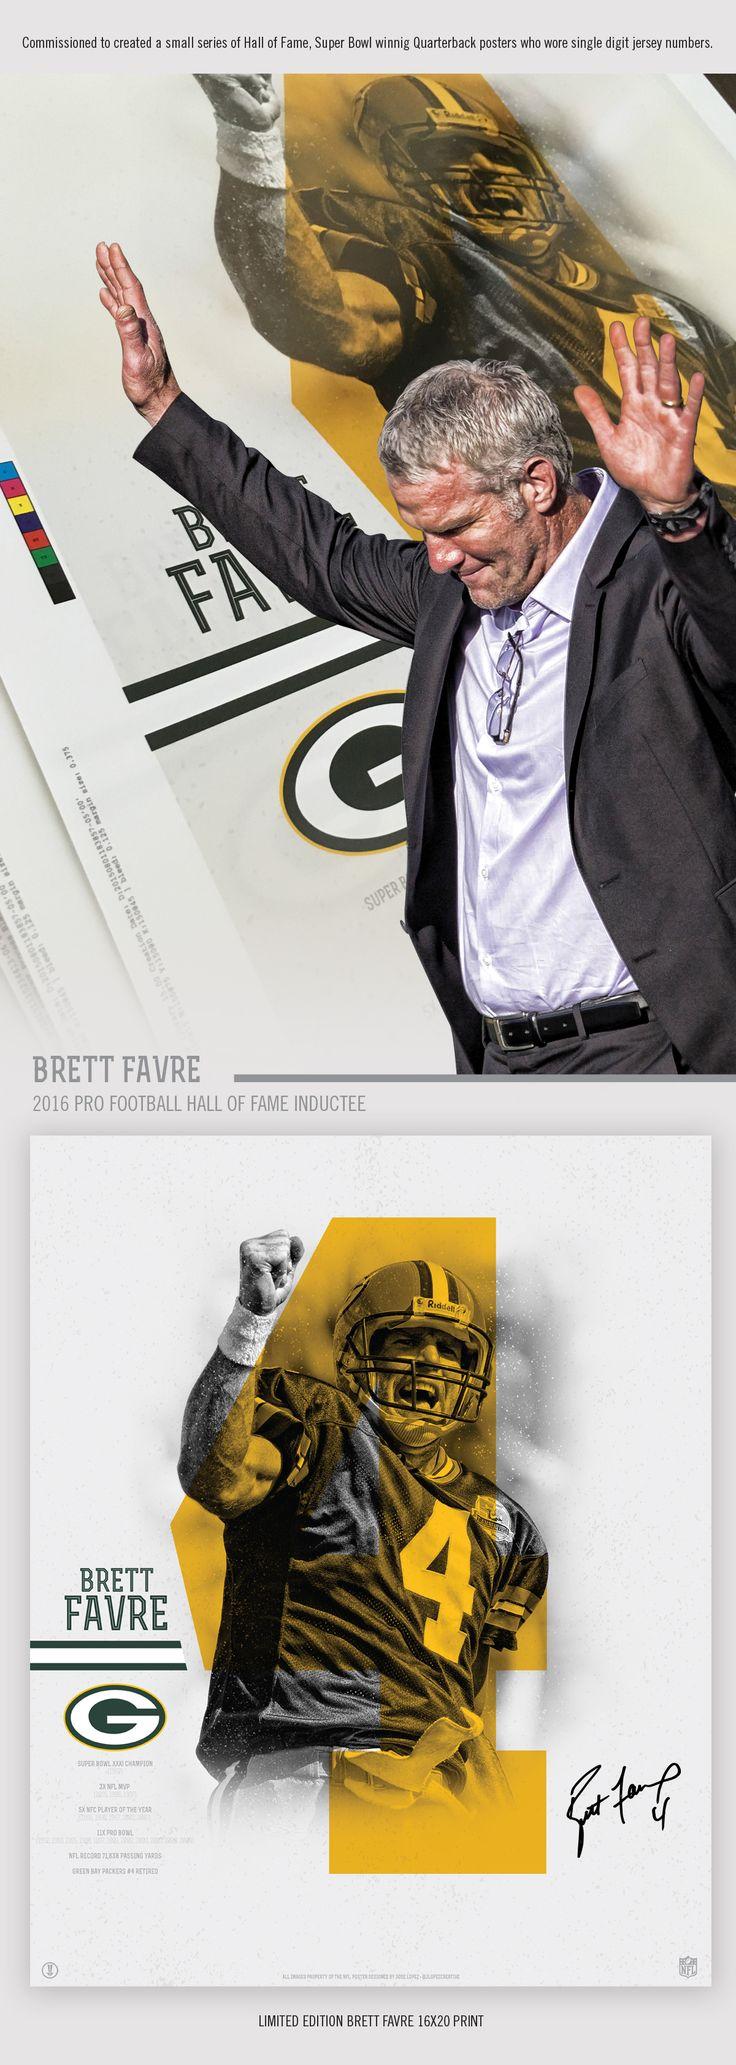 Designed three 16x20 Limited Edition prints for Hall of Fame winning Quarterbacks.